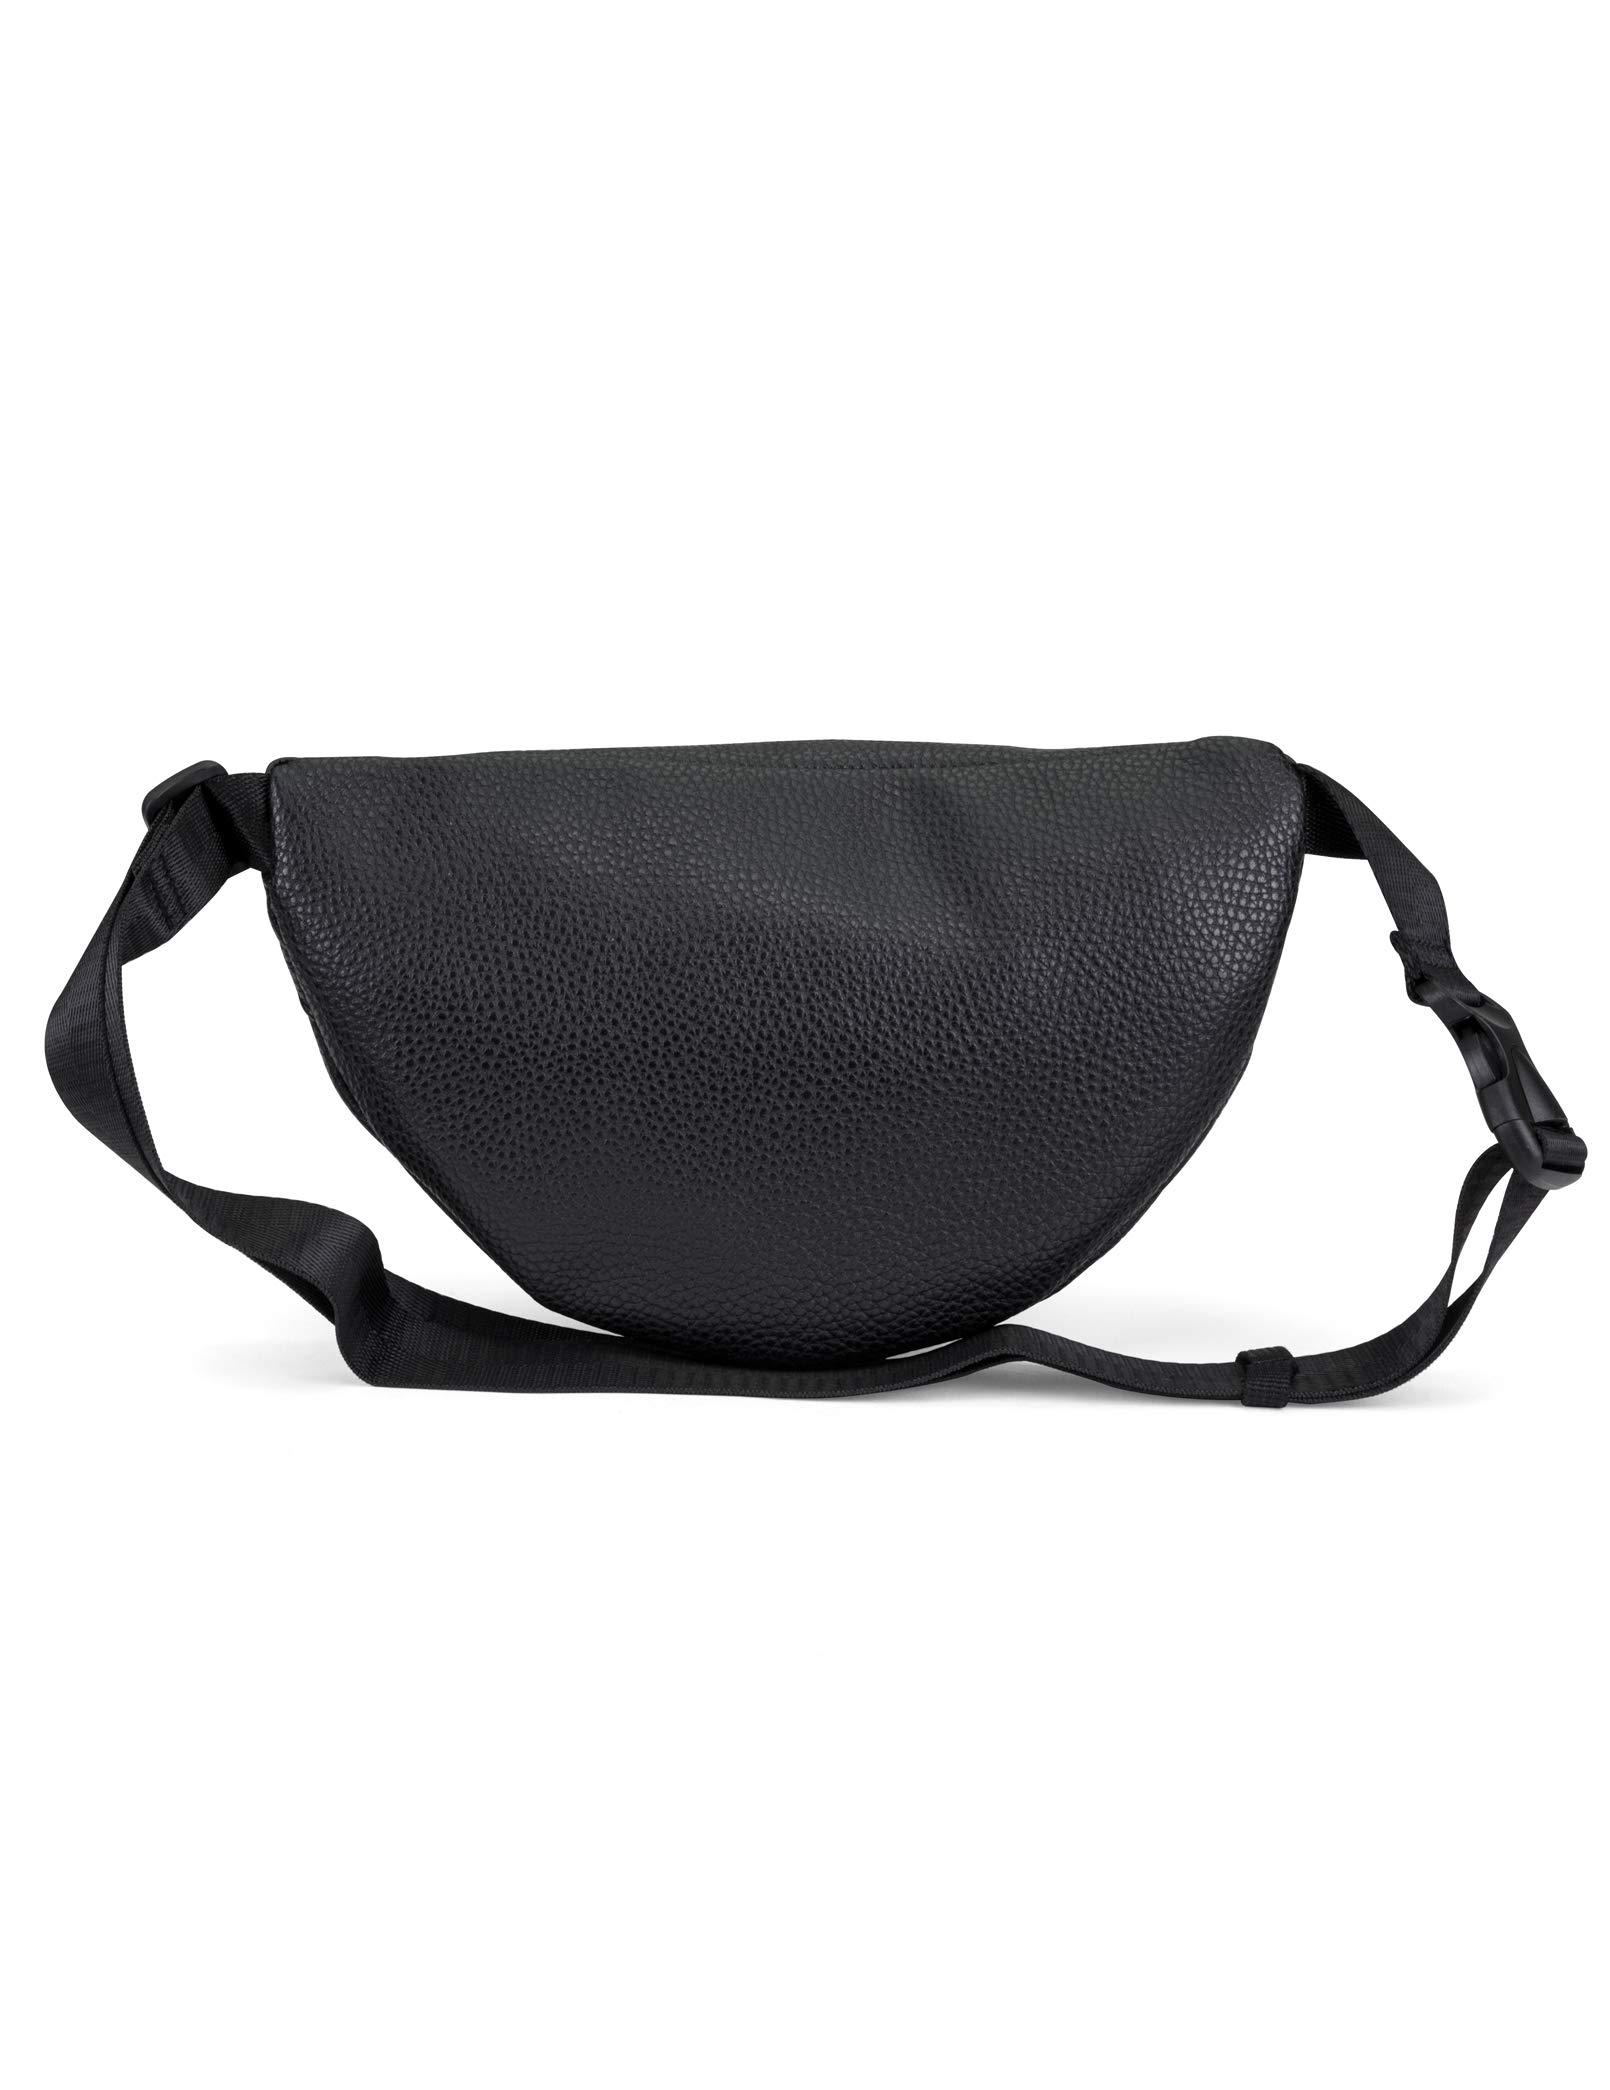 Vegan Chicks Love Sport Waist Bag Fanny Pack Adjustable For Travel